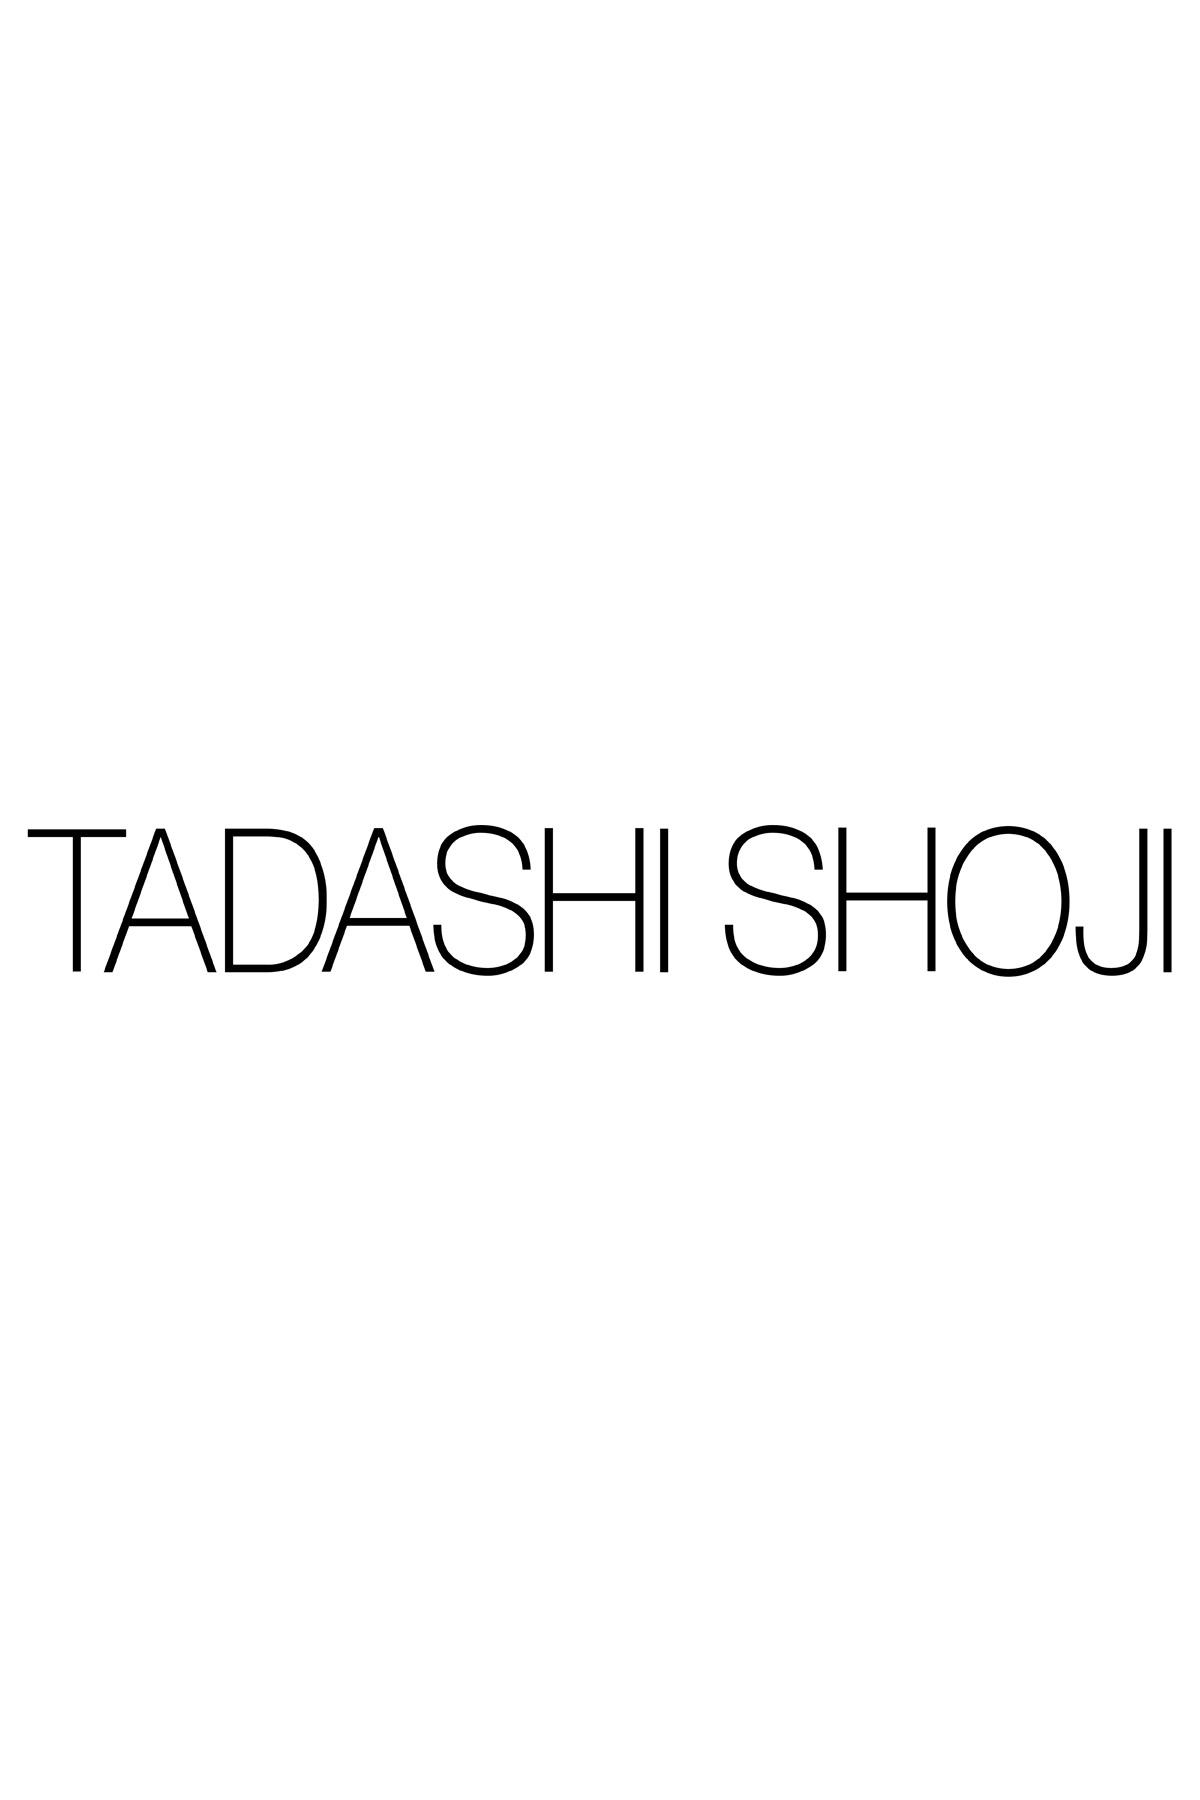 Tadashi Shoji - Mirabelle Embroidered Dress - PETITE